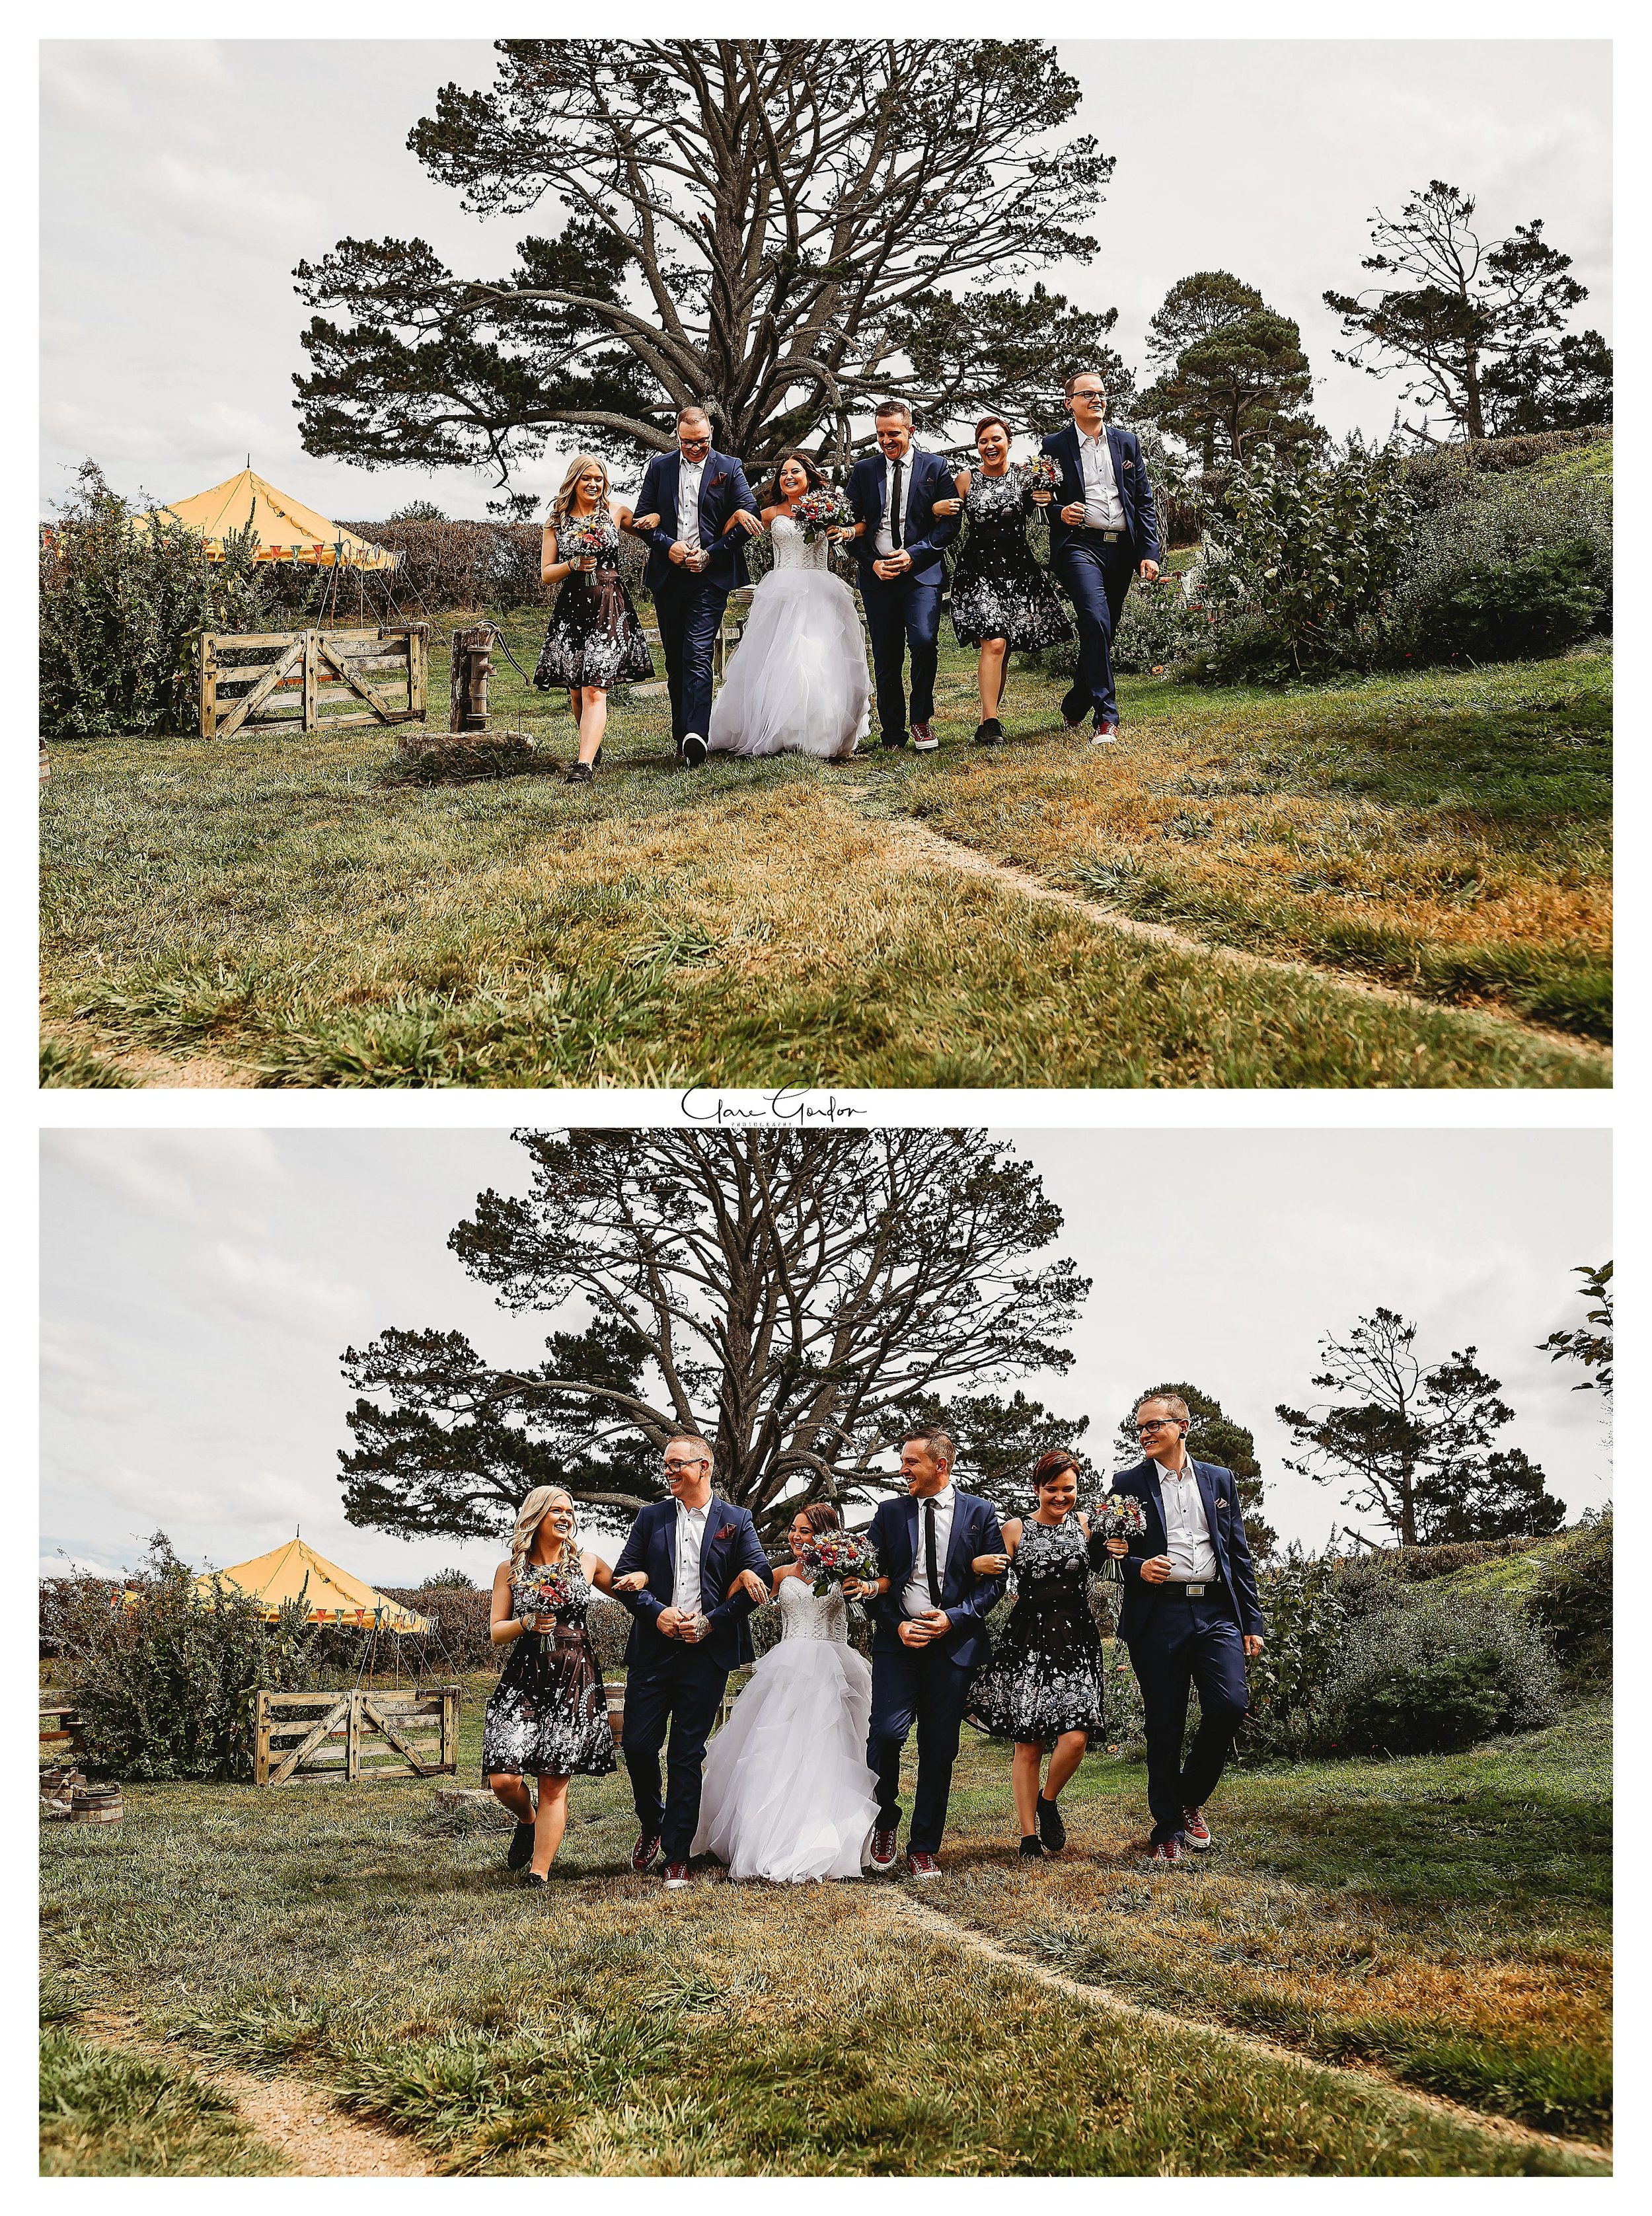 Hobbiton-bridal-party-wedding-photo